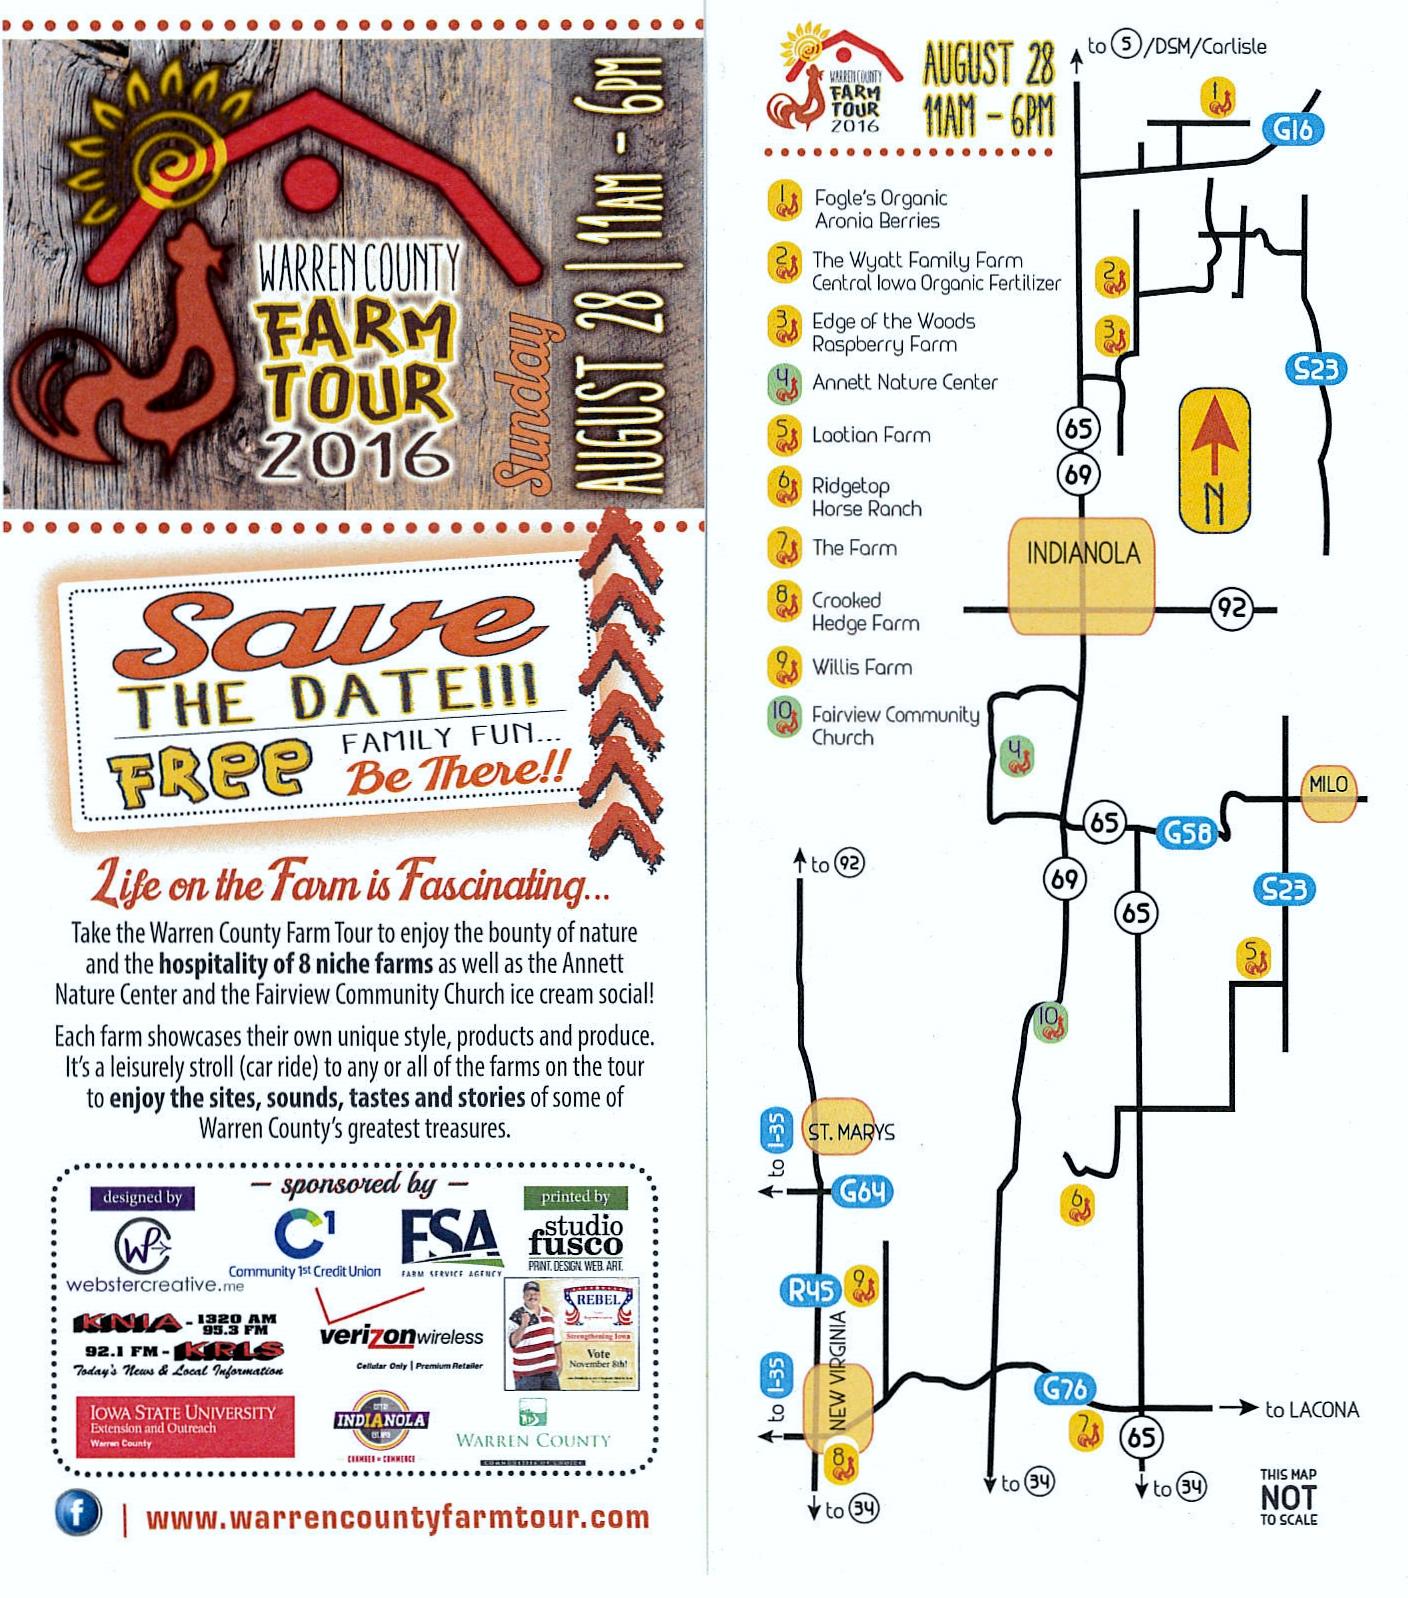 2016 Farm Tour Map